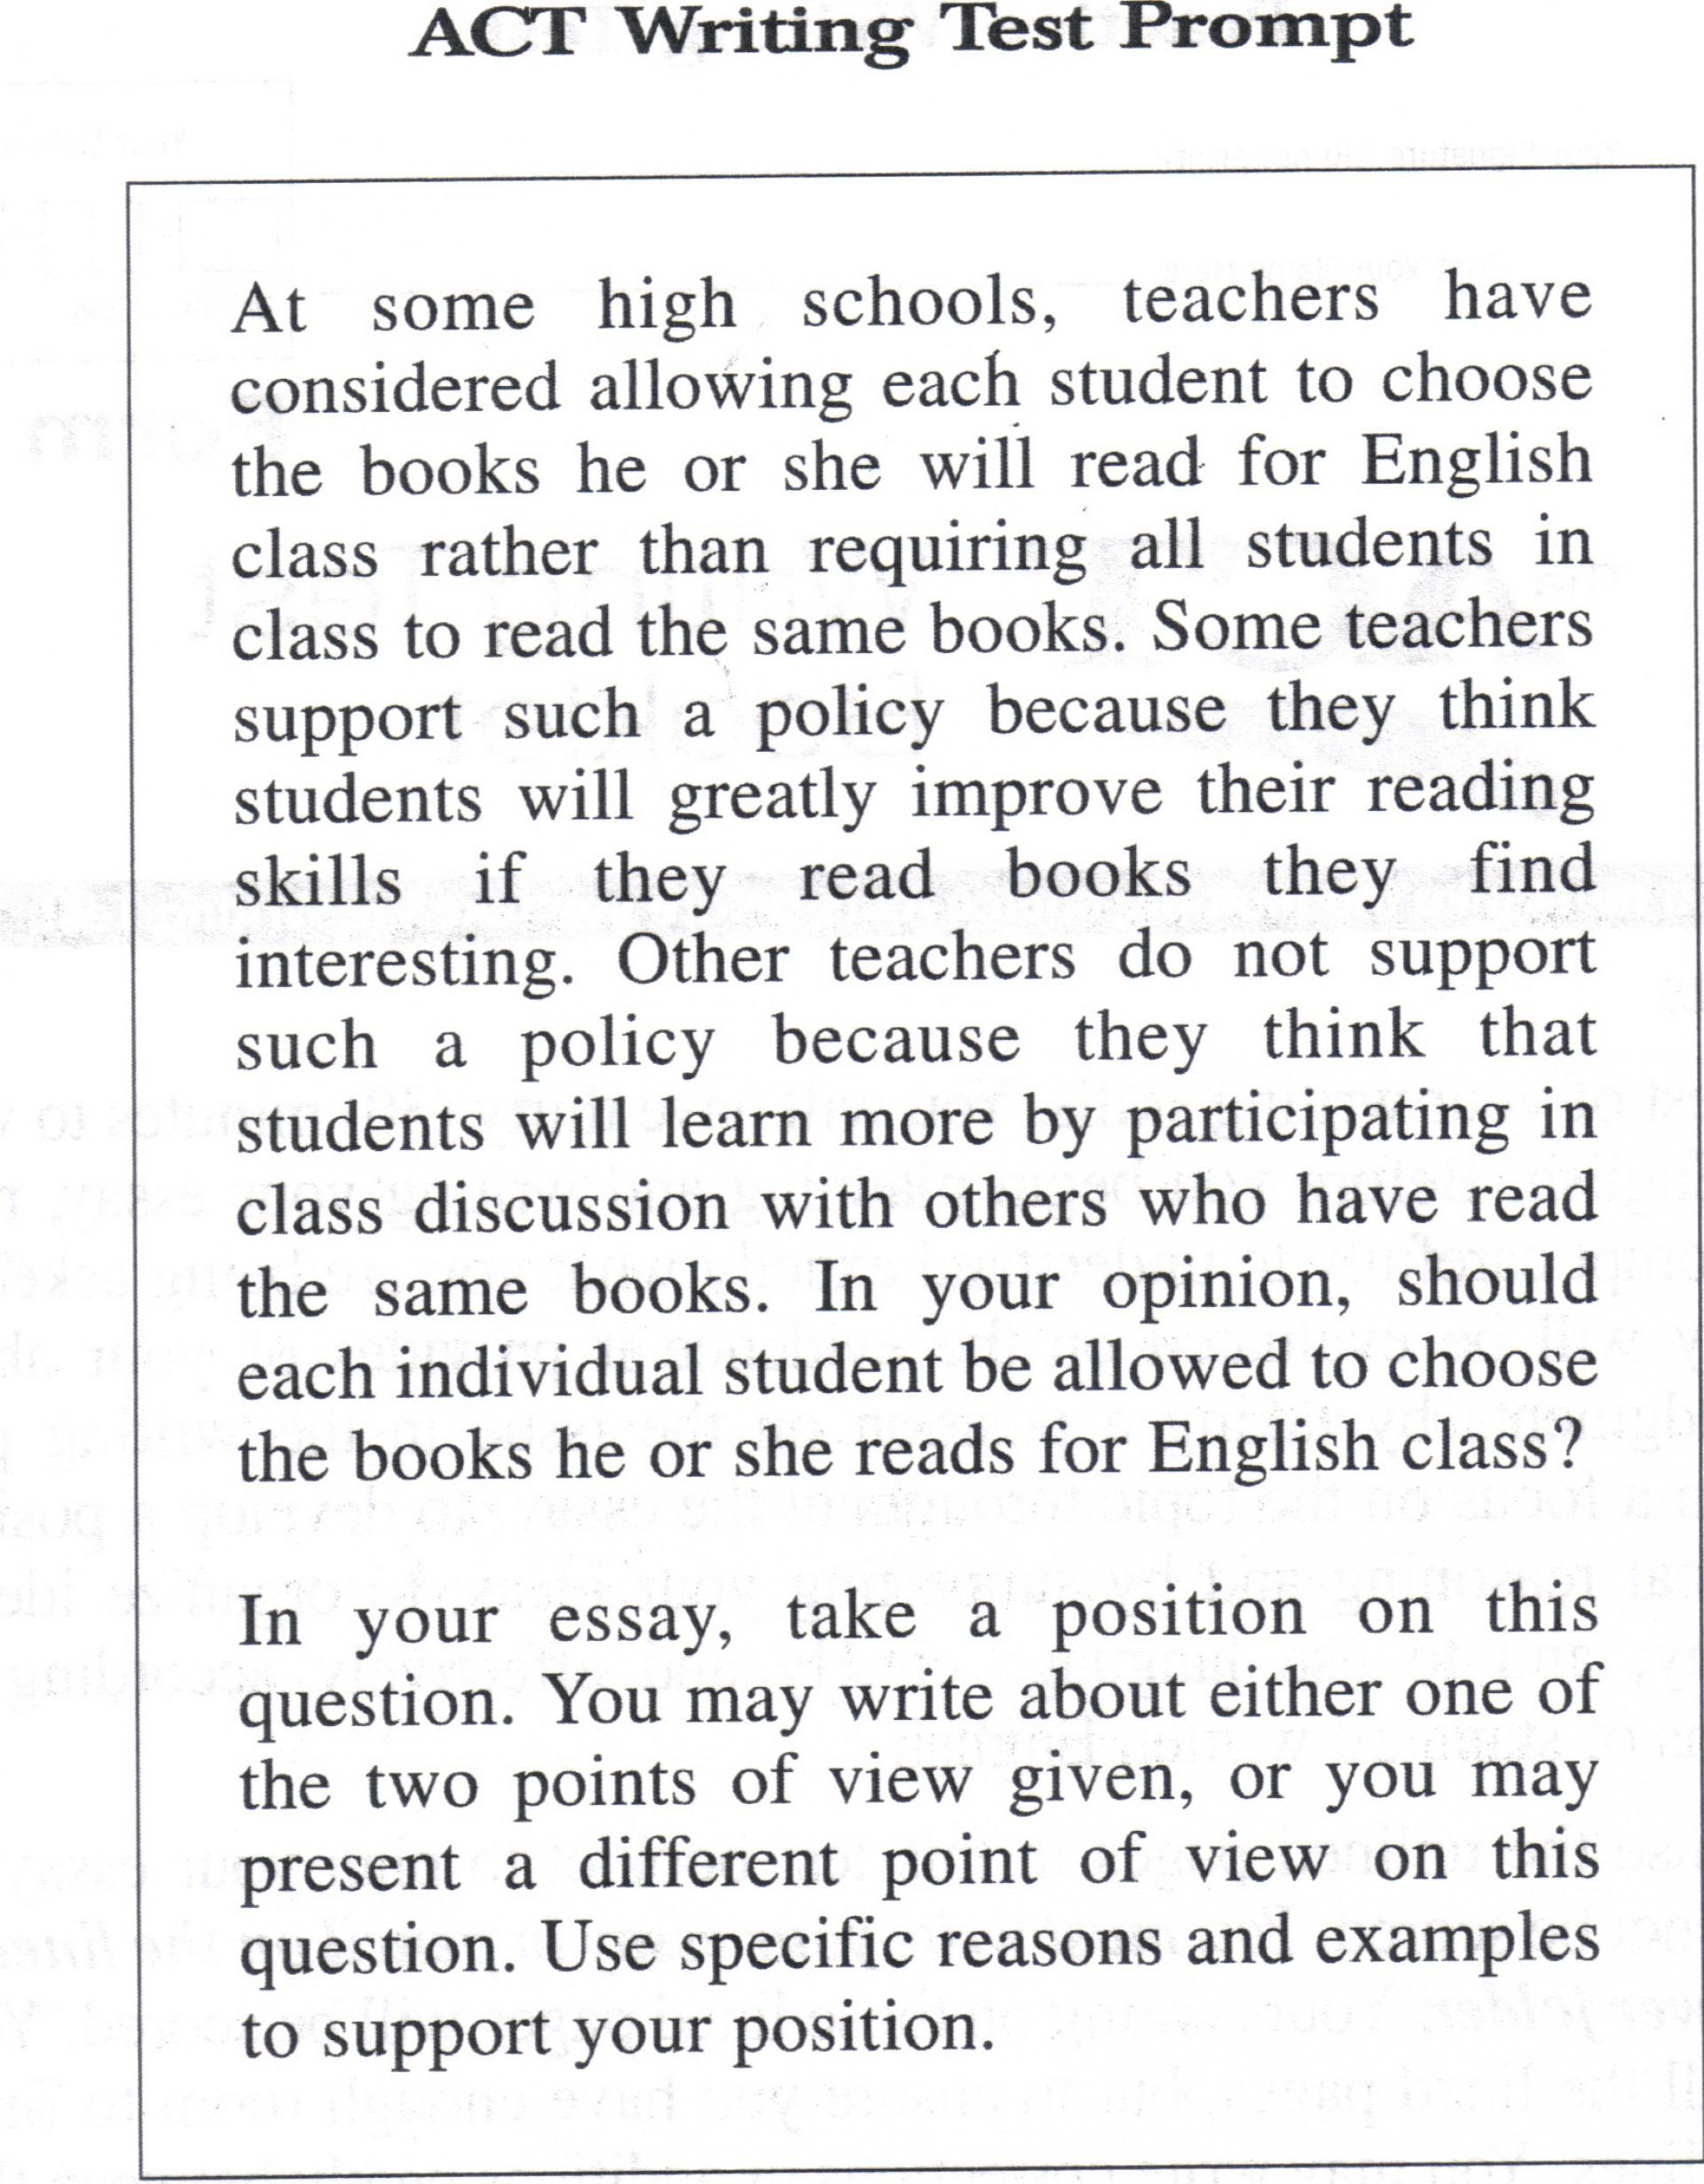 004 Act Essay Tips Actwritepromptbookchoice Incredible Prepscholar 1920